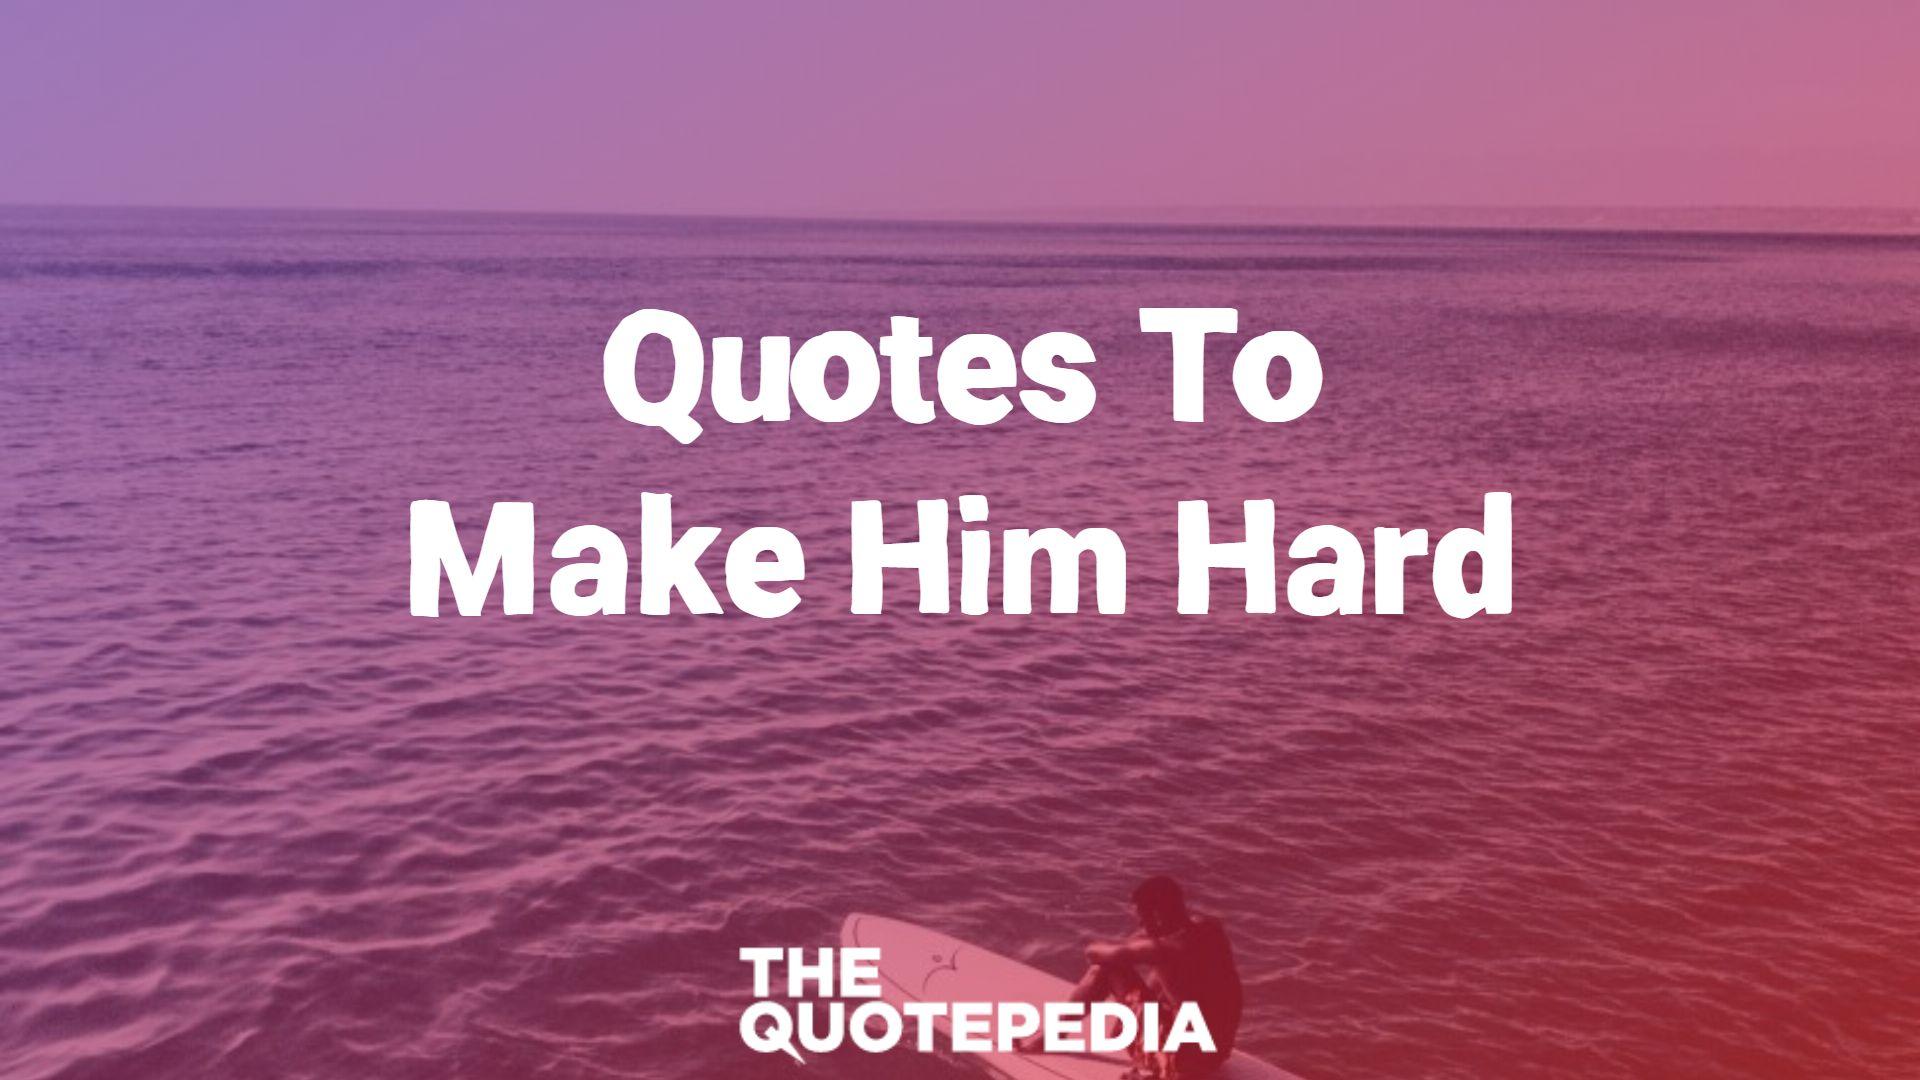 Quotes To Make Him Hard